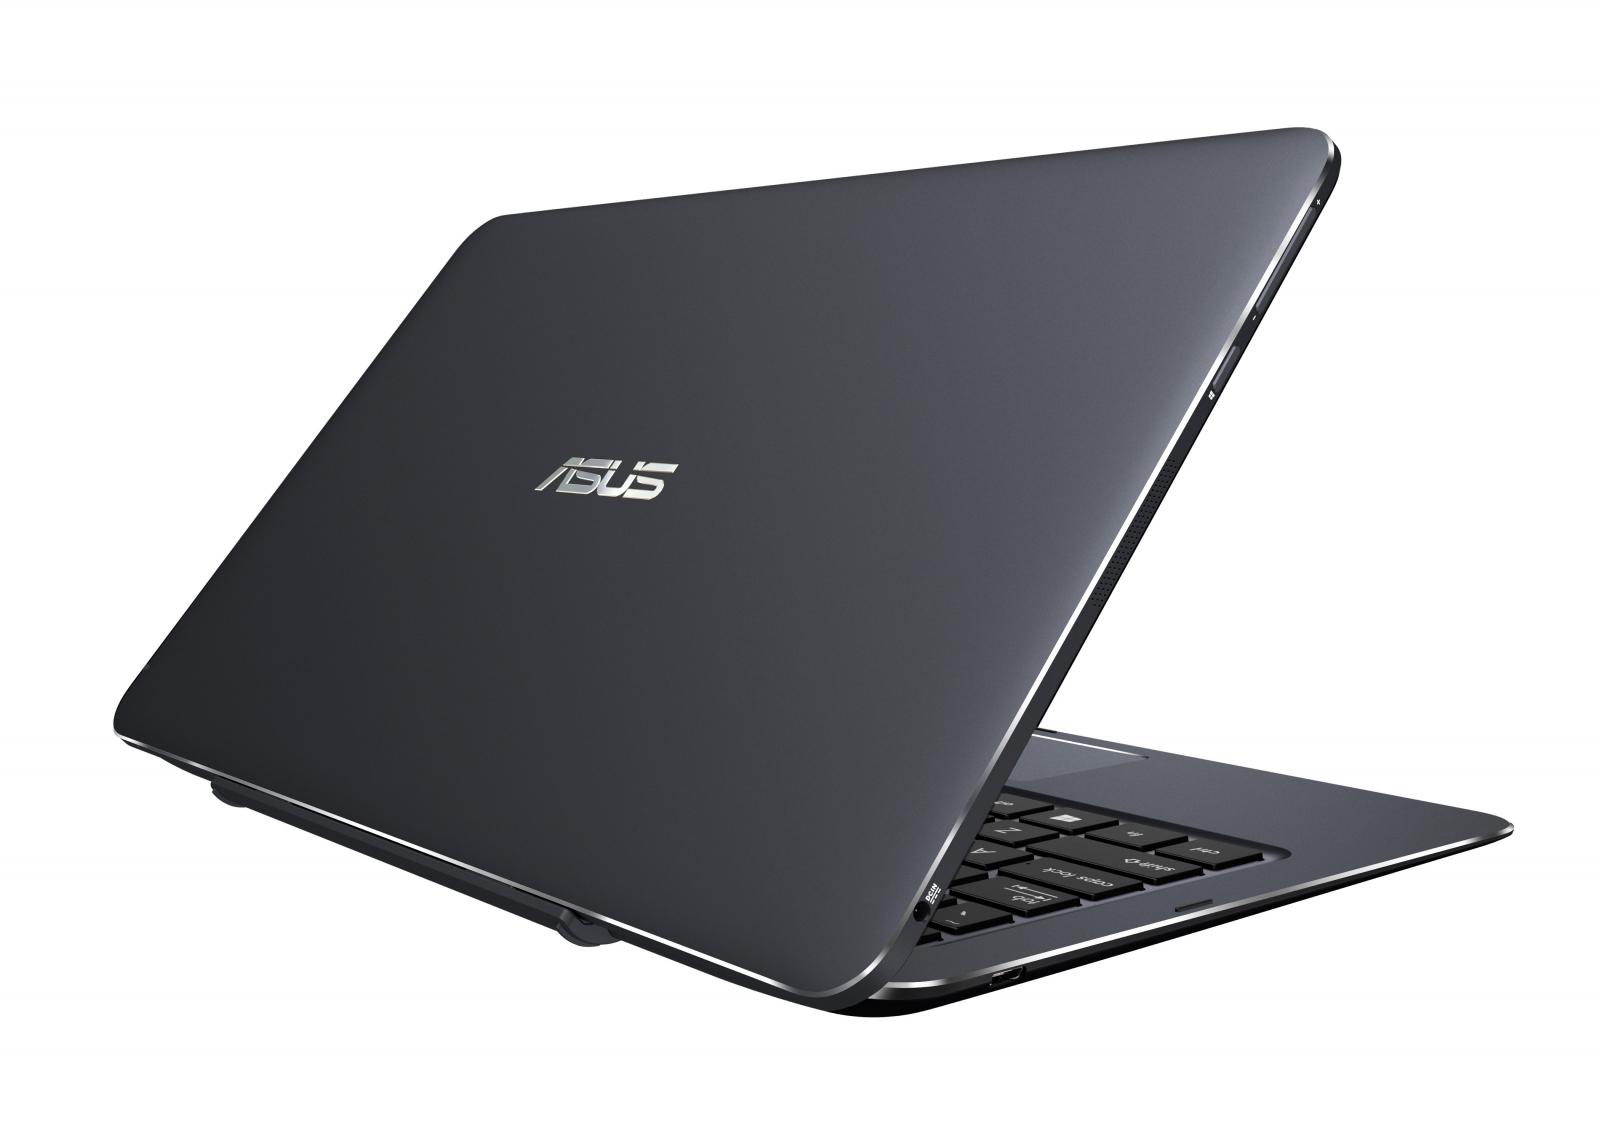 Asus Transformer Book T300 Chi hybrid laptop